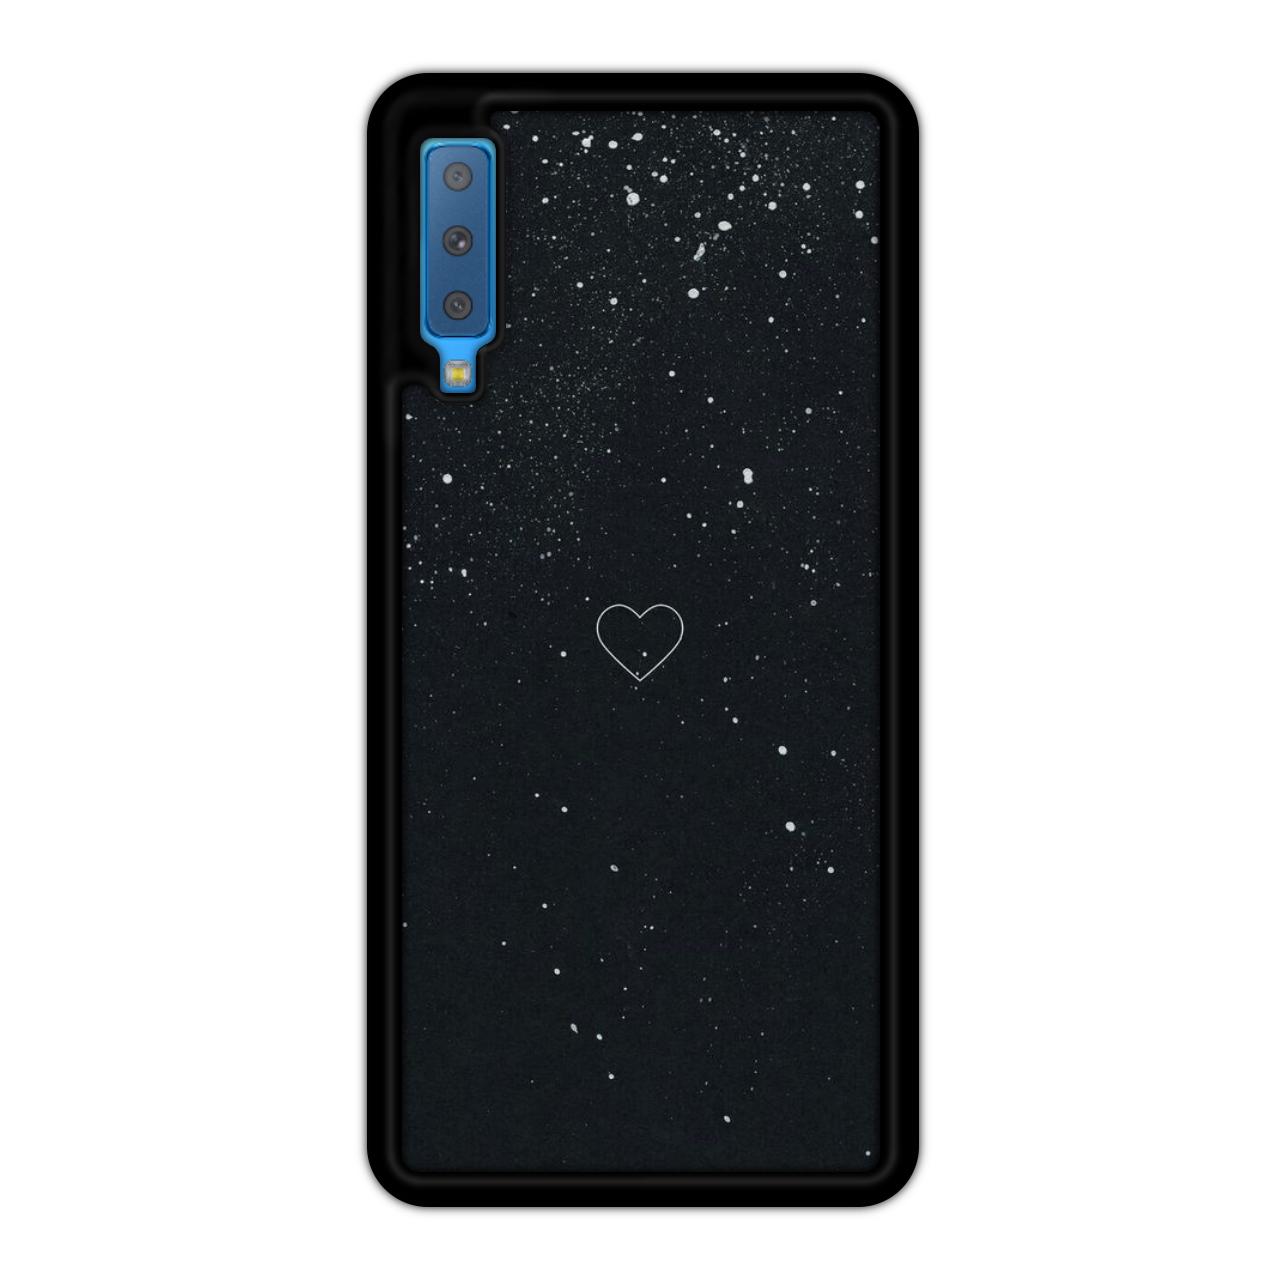 کاور آکام مدل Aasev1559 مناسب برای گوشی موبایل سامسونگ Galaxy A7 2018